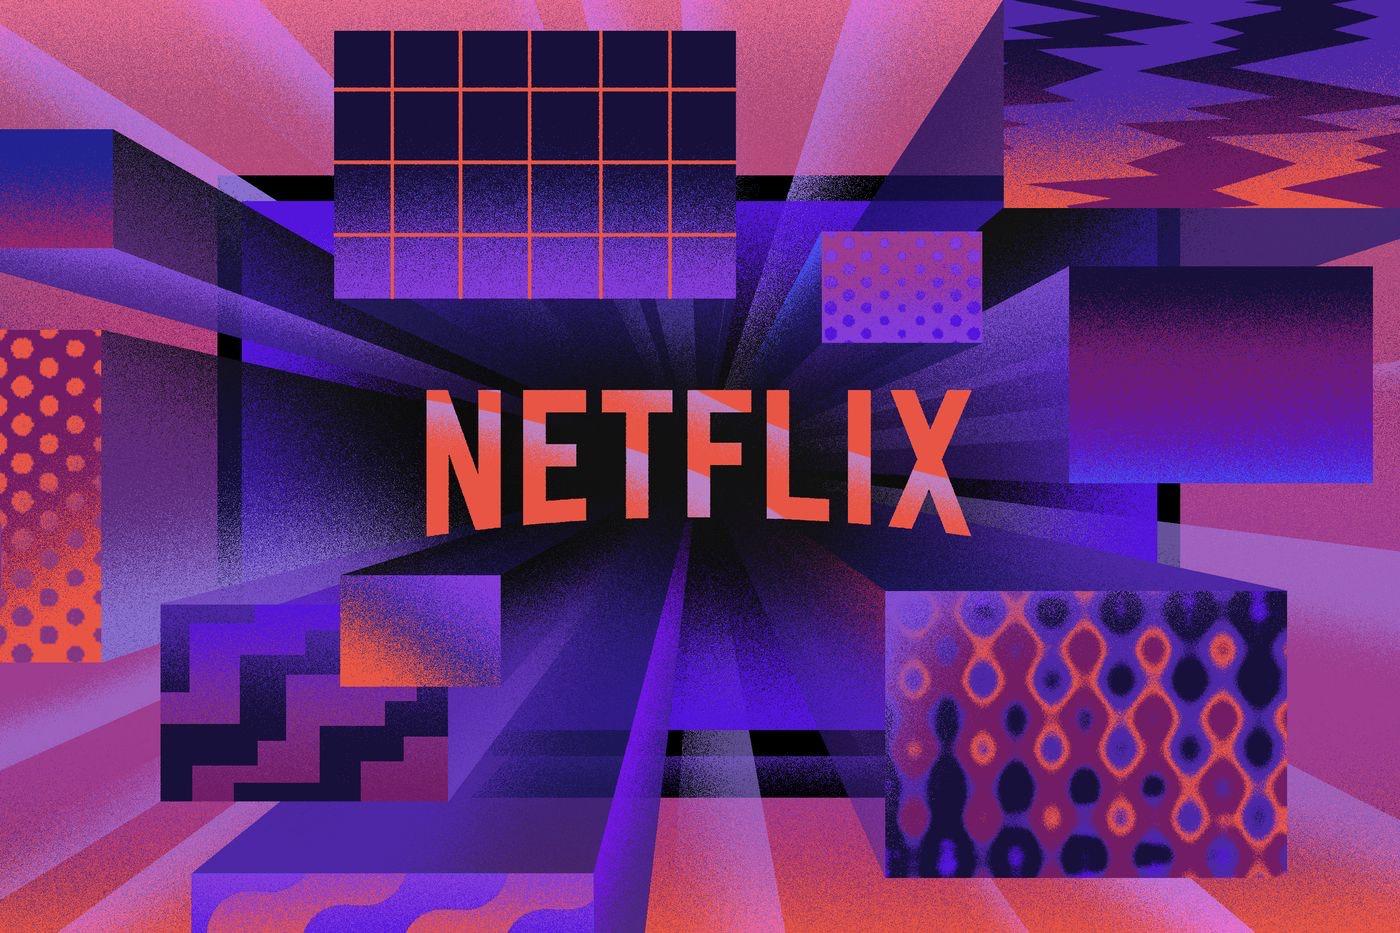 《Netflix账号合租拼车平台大盘点|如何买到稳定又便宜的Netflix账号?》